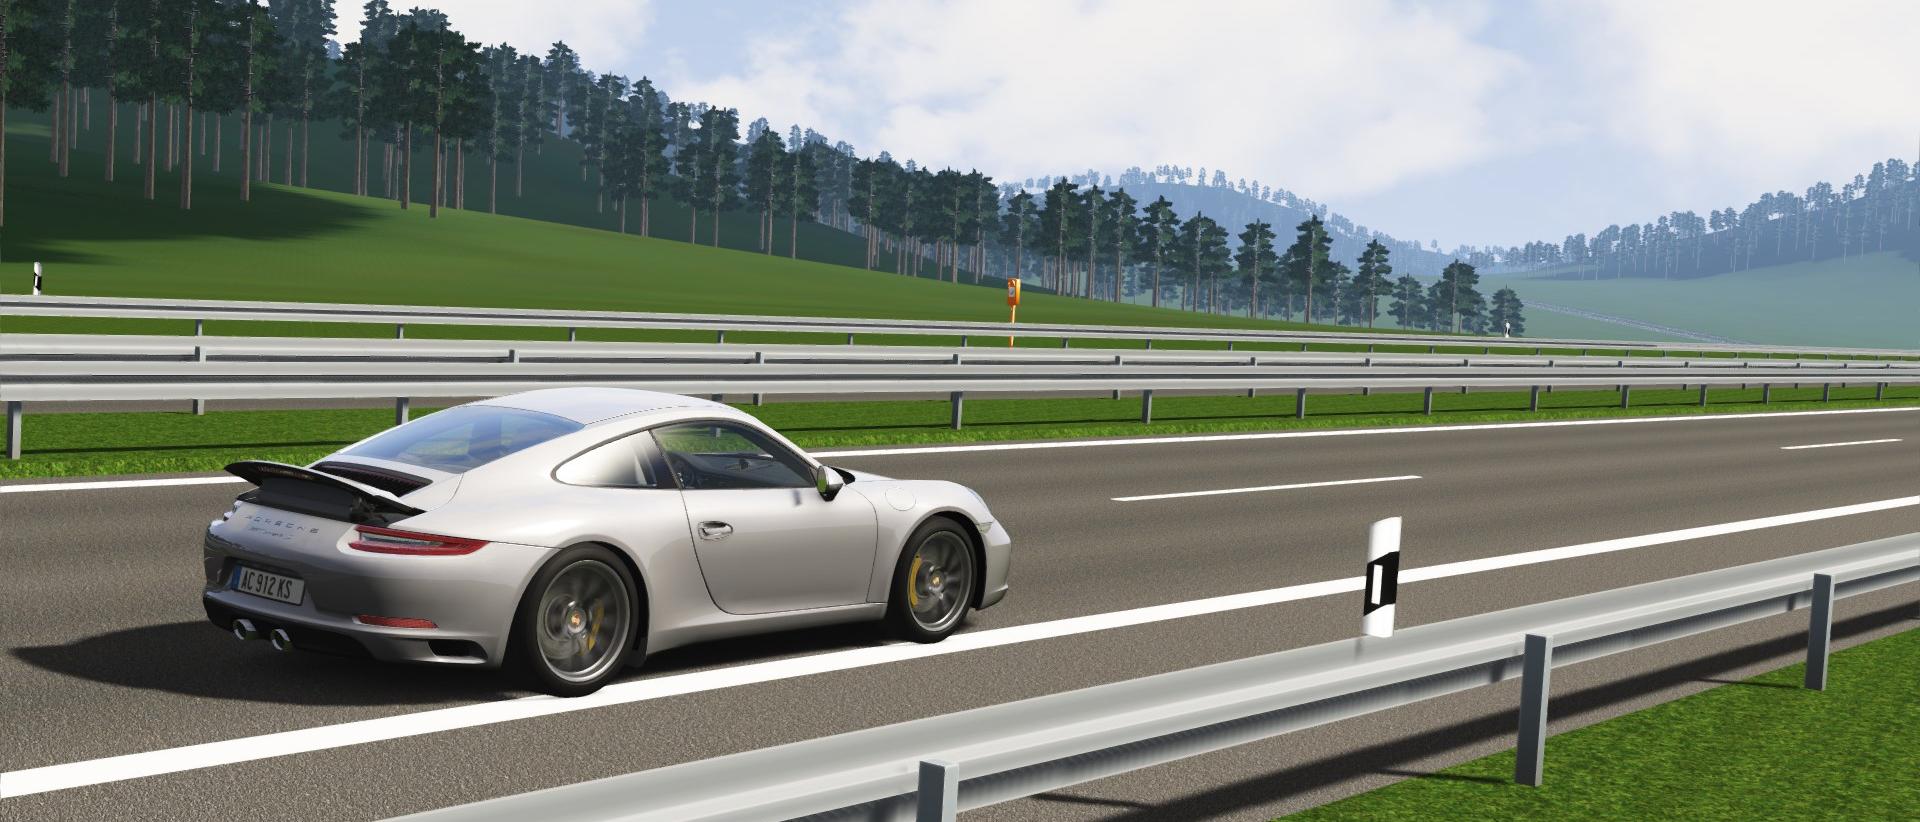 Screenshot_ks_porsche_991_carrera_s_Autobahn_3-12-116-0-3-18.jpg